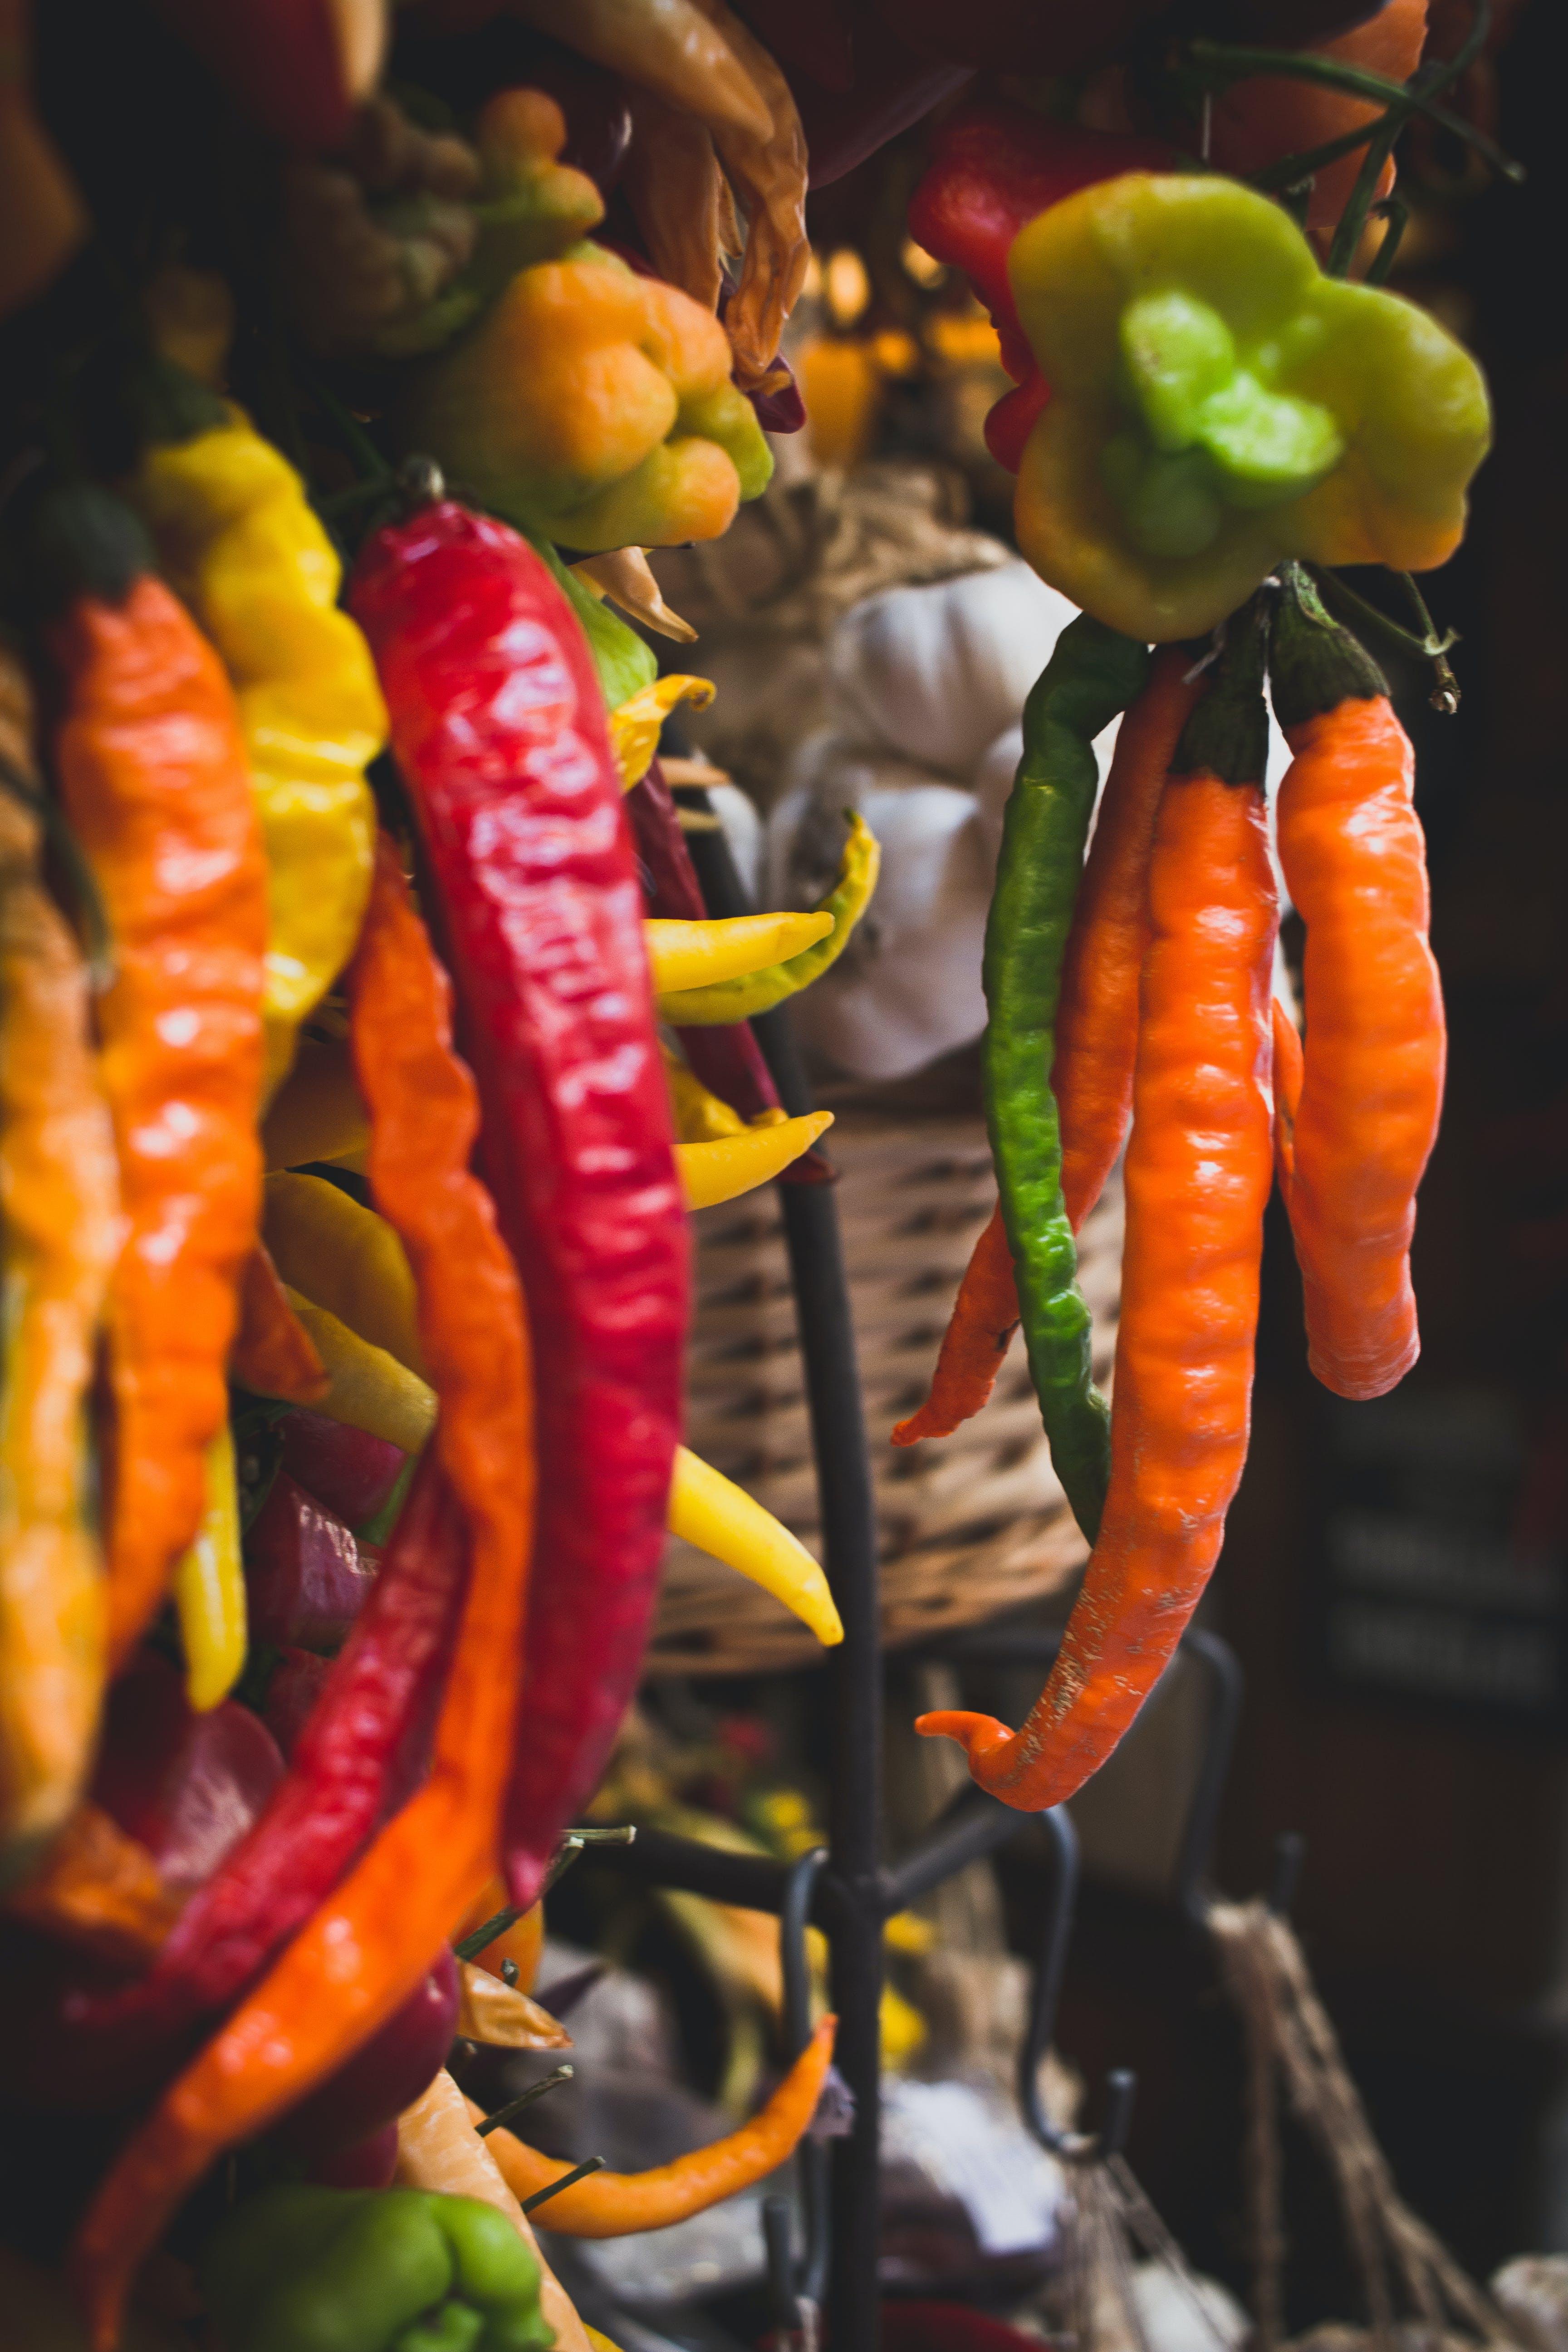 Free stock photo of chili peppers, farmers market, mallorca, market